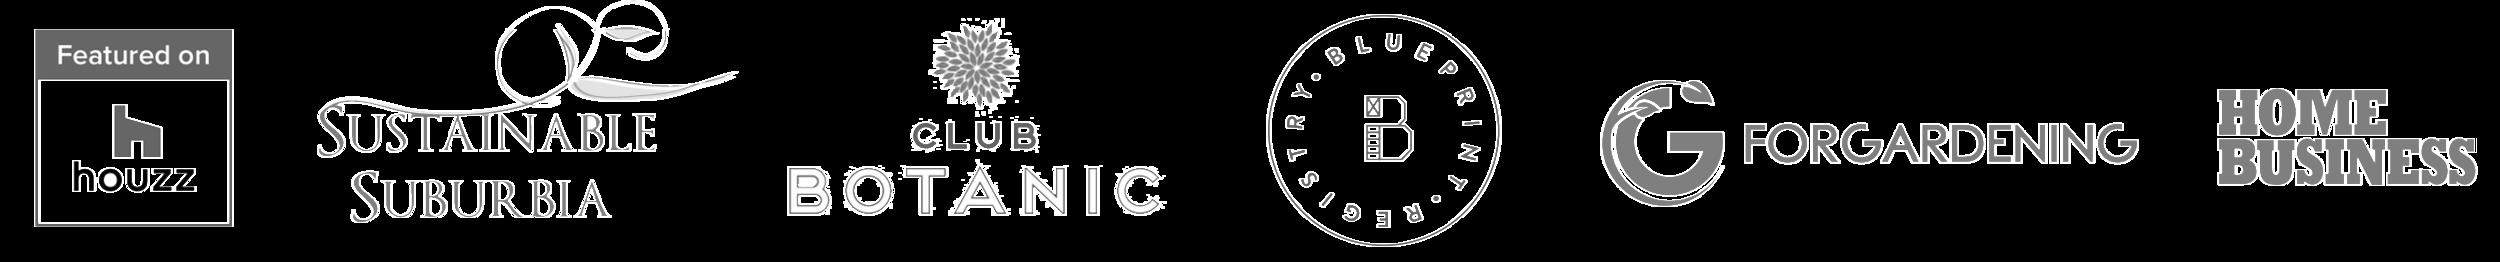 logos_Web-Featured-in-logos_transparent-18.png